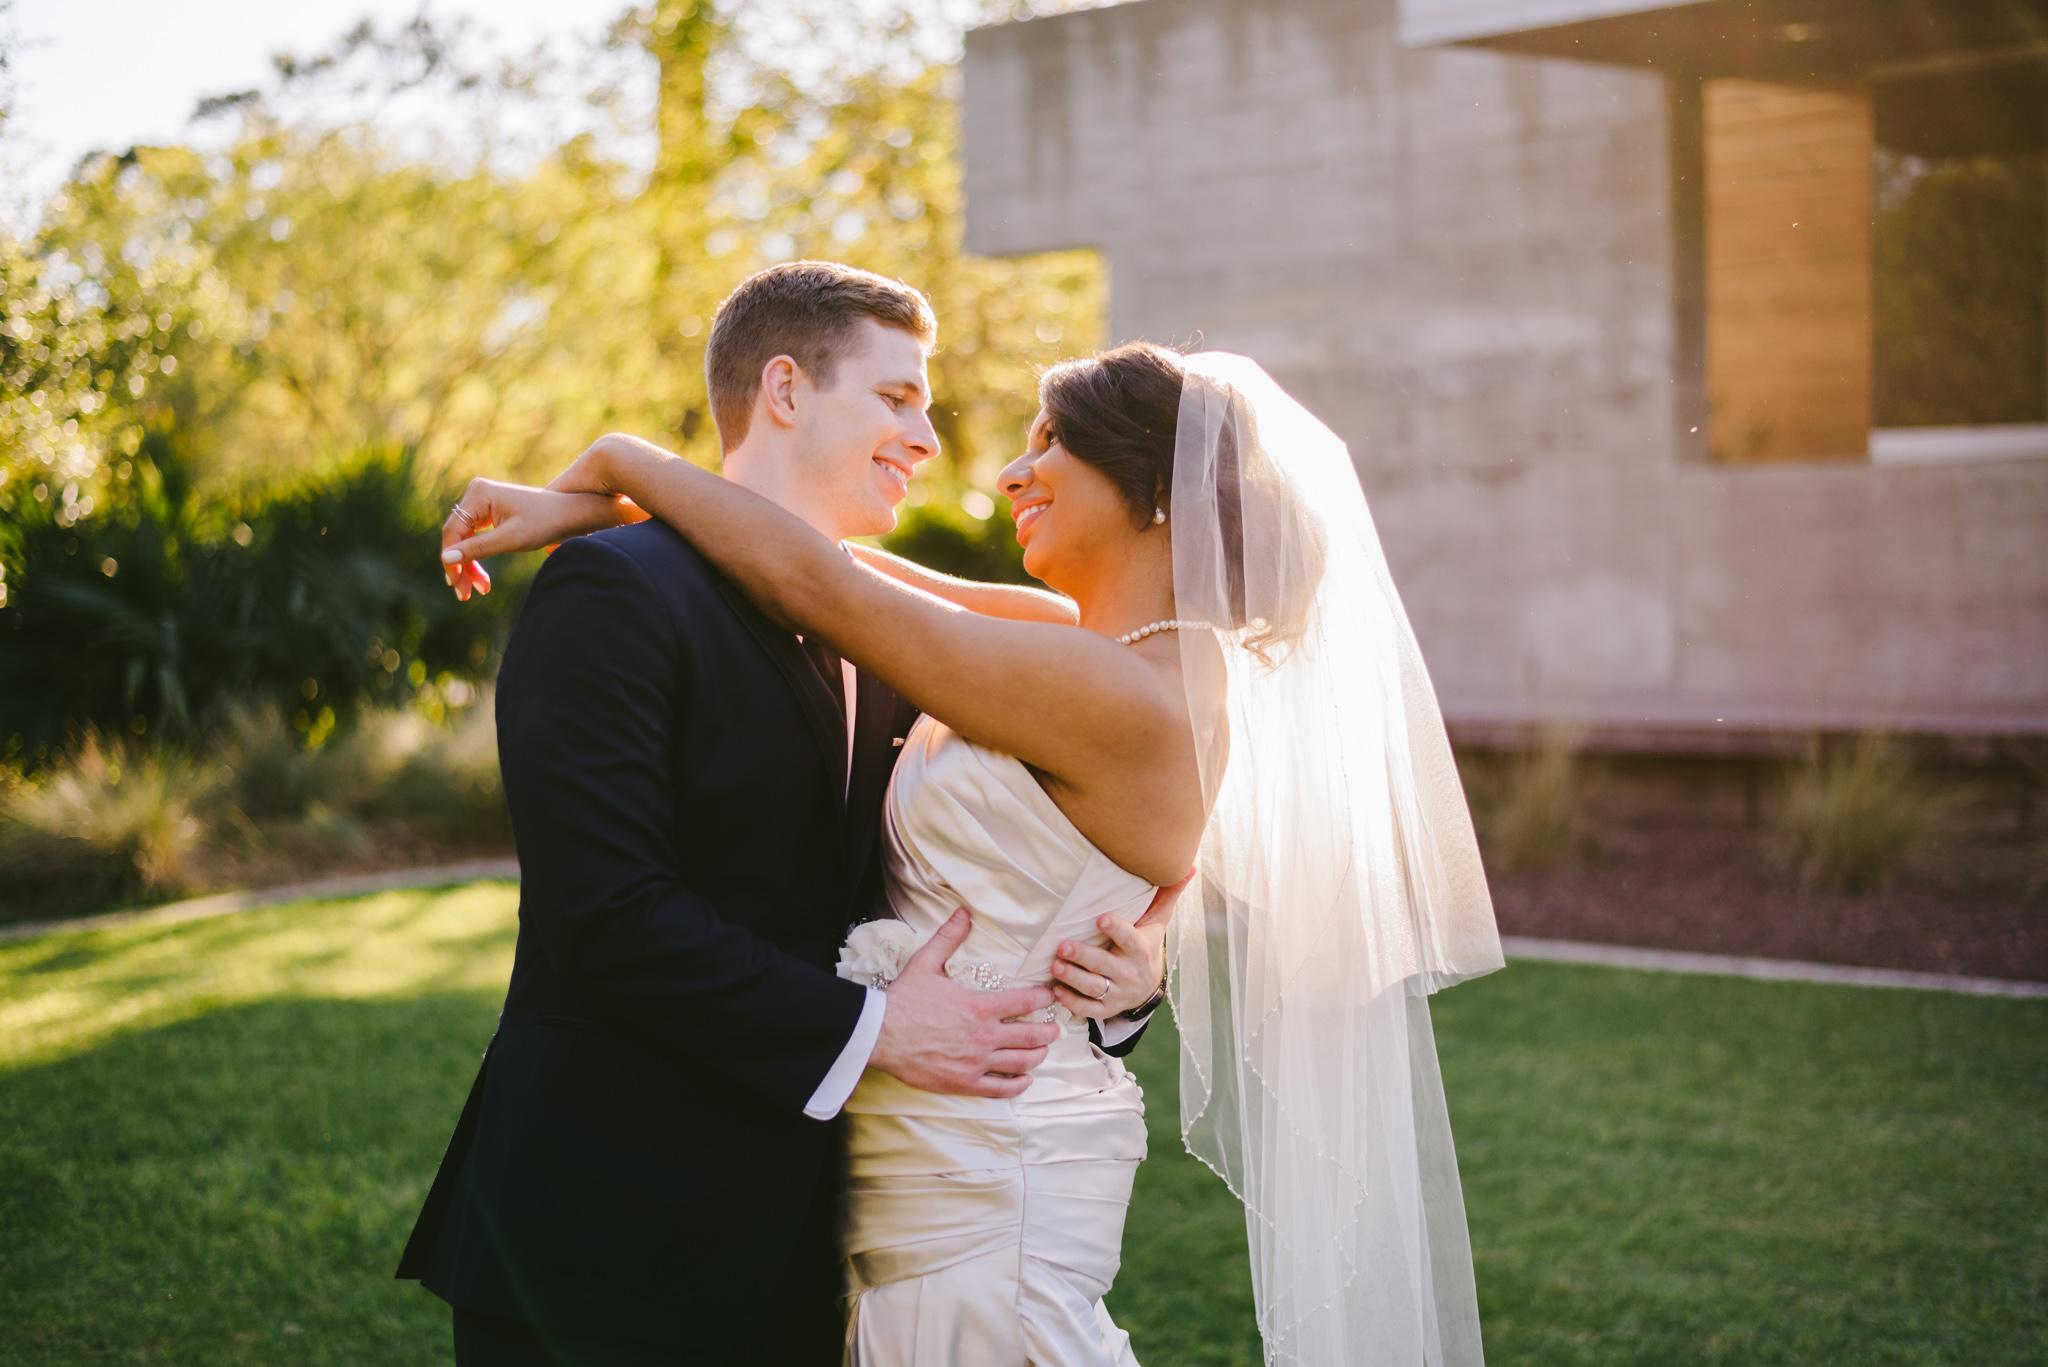 Hozik_Wedding-608.jpg